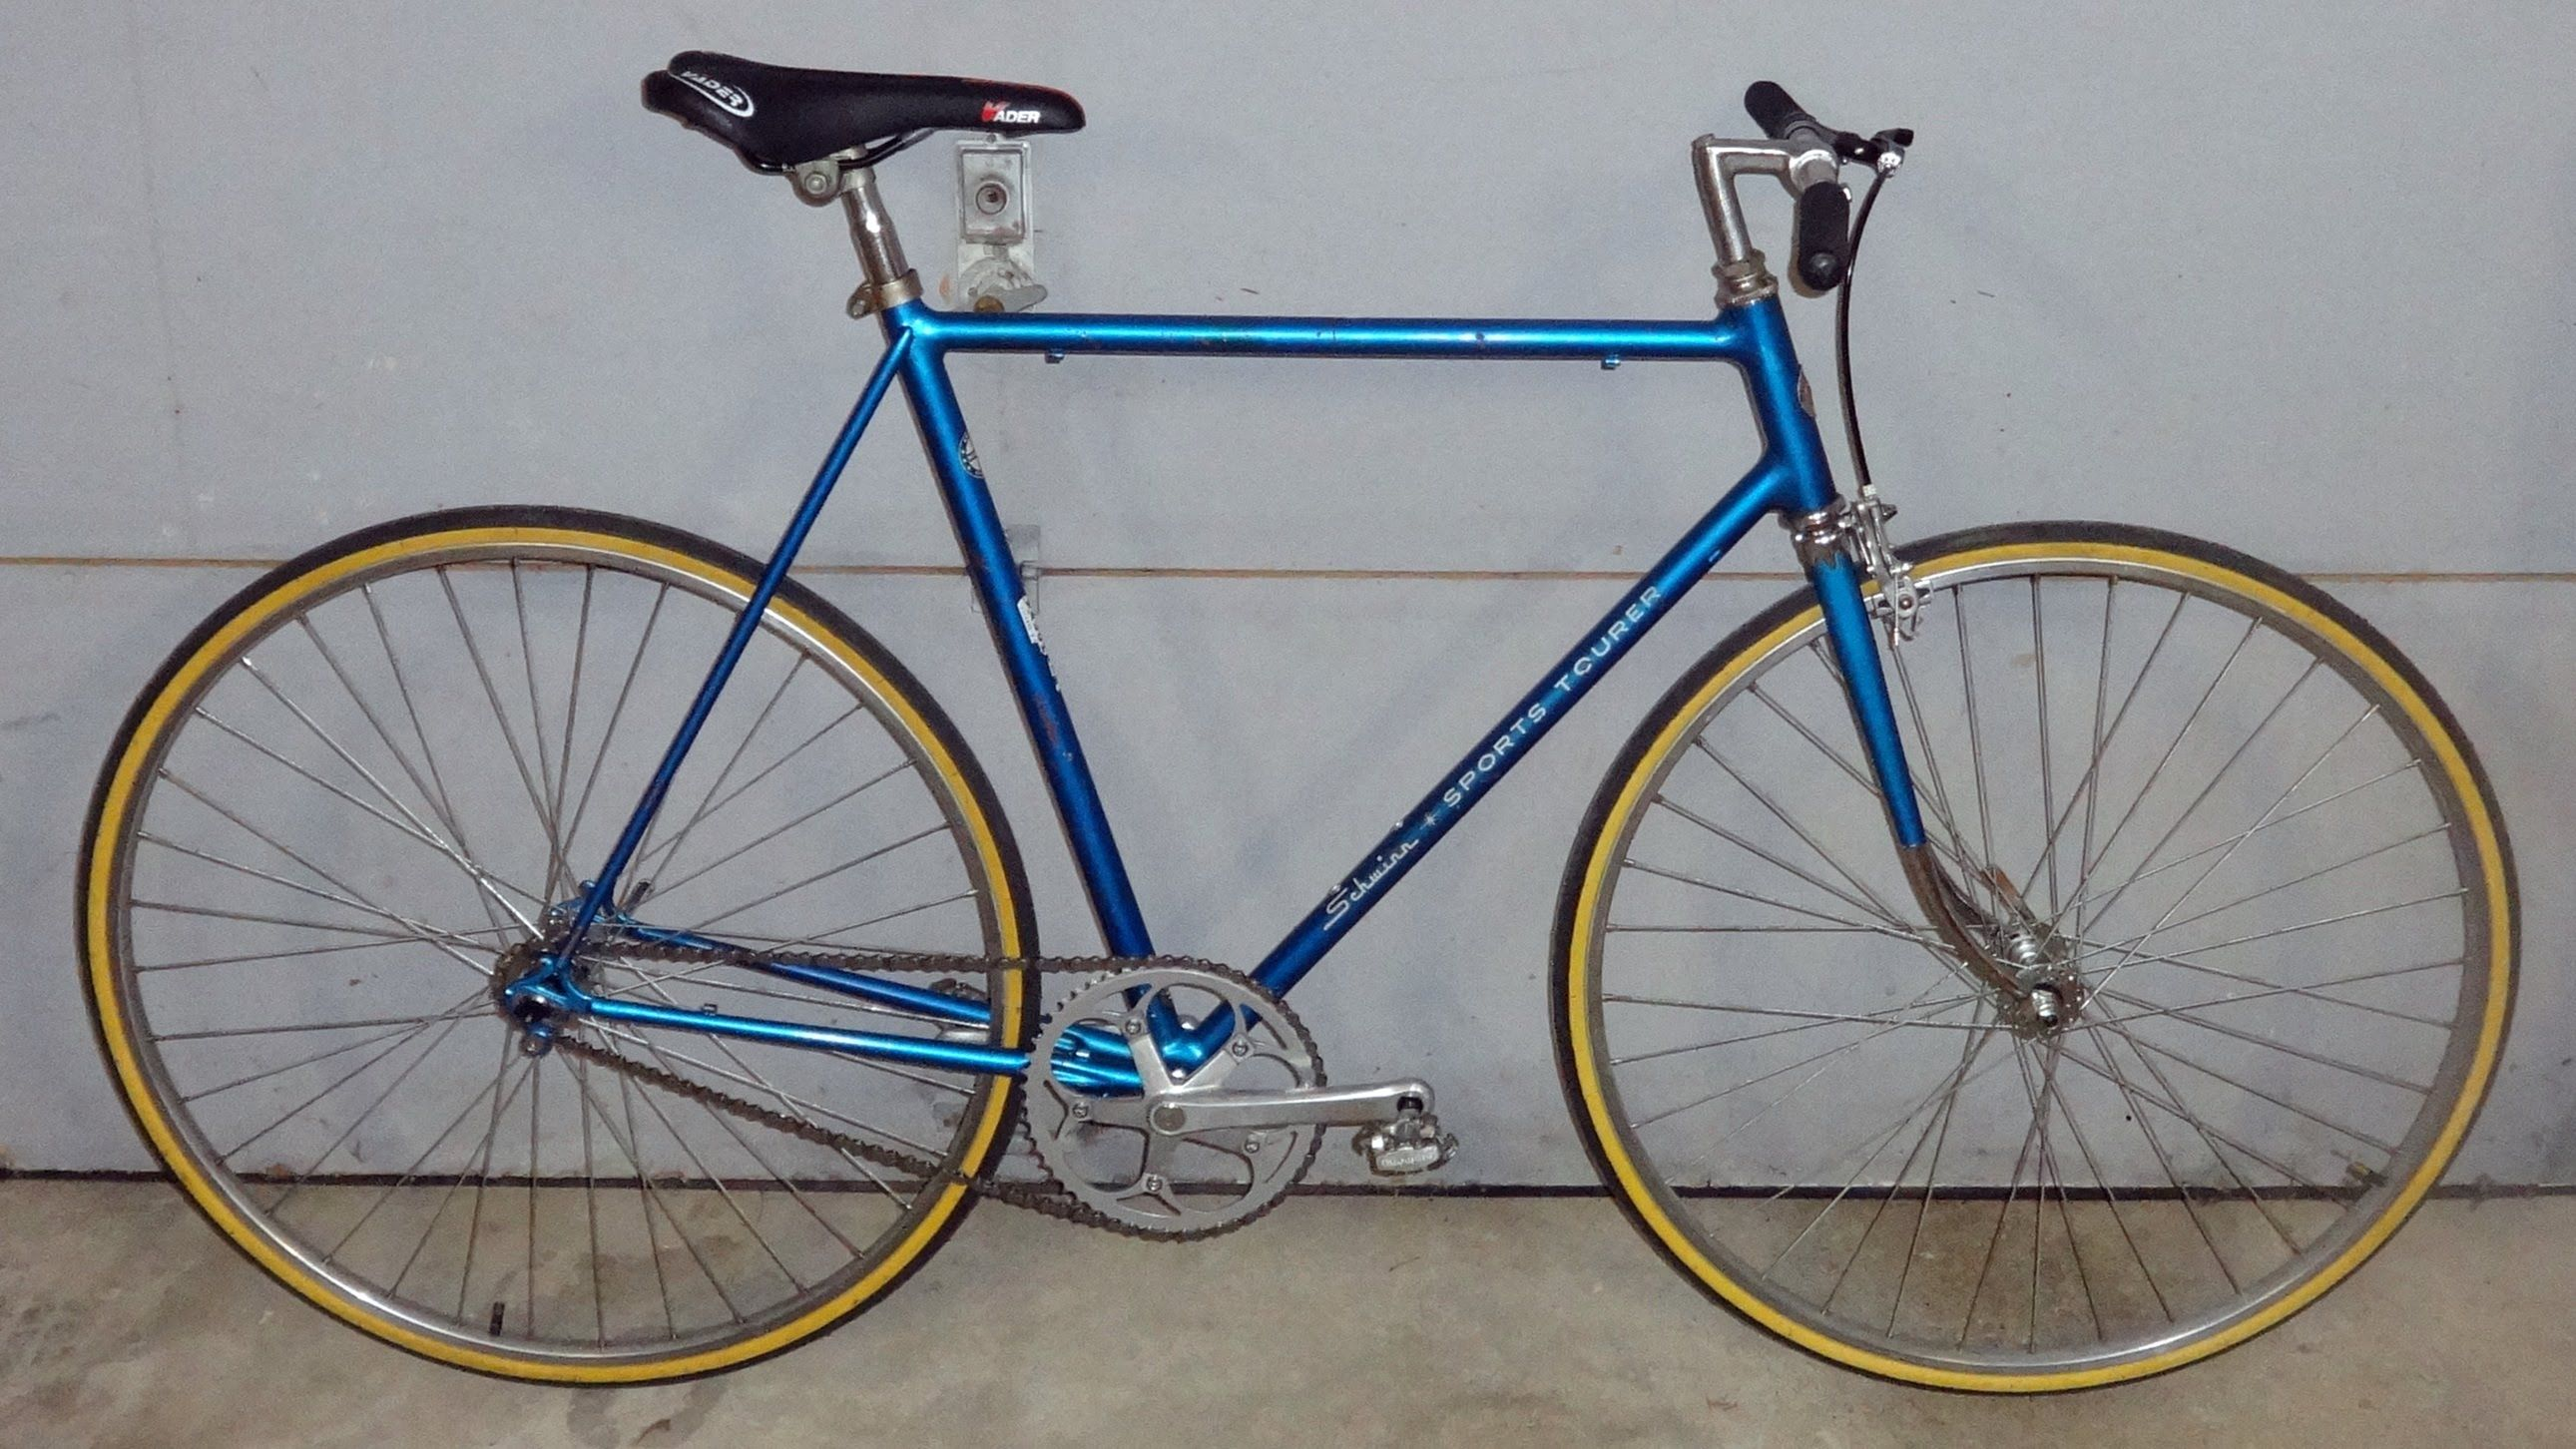 How To Build A Cheap Fixie From A Vintage Bike Bike Repair Single Gear Bike Fixie